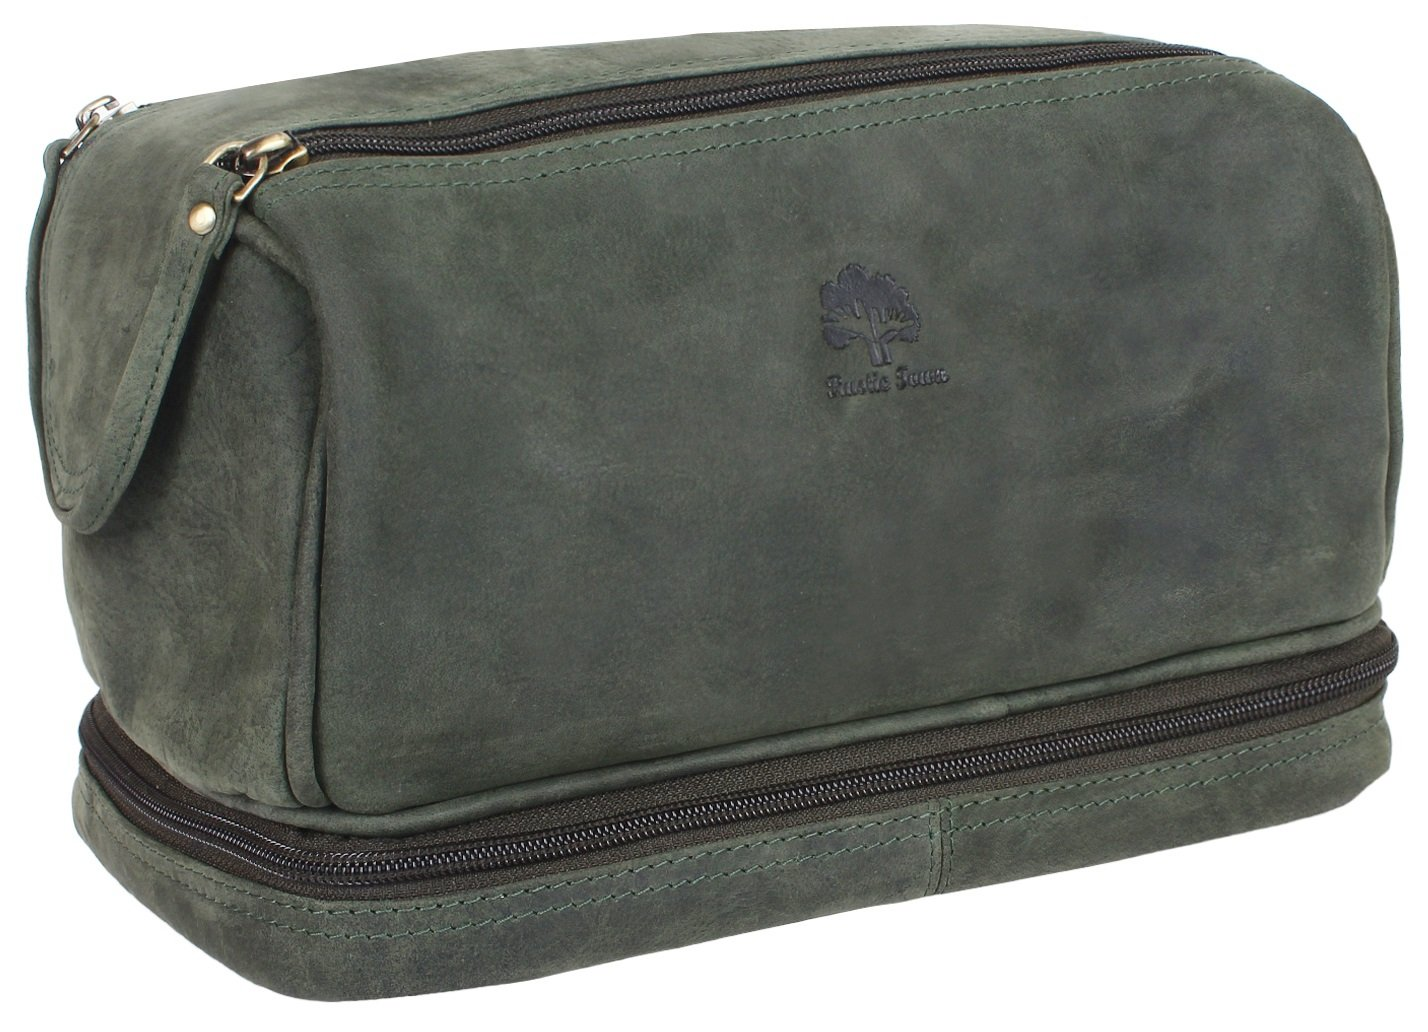 Leather Toiletry Bag Men Women Travel Shaving Bag Travel Bag Organizer Dopp  Kit  Amazon.co.uk  Clothing a5da3ebd1b81e